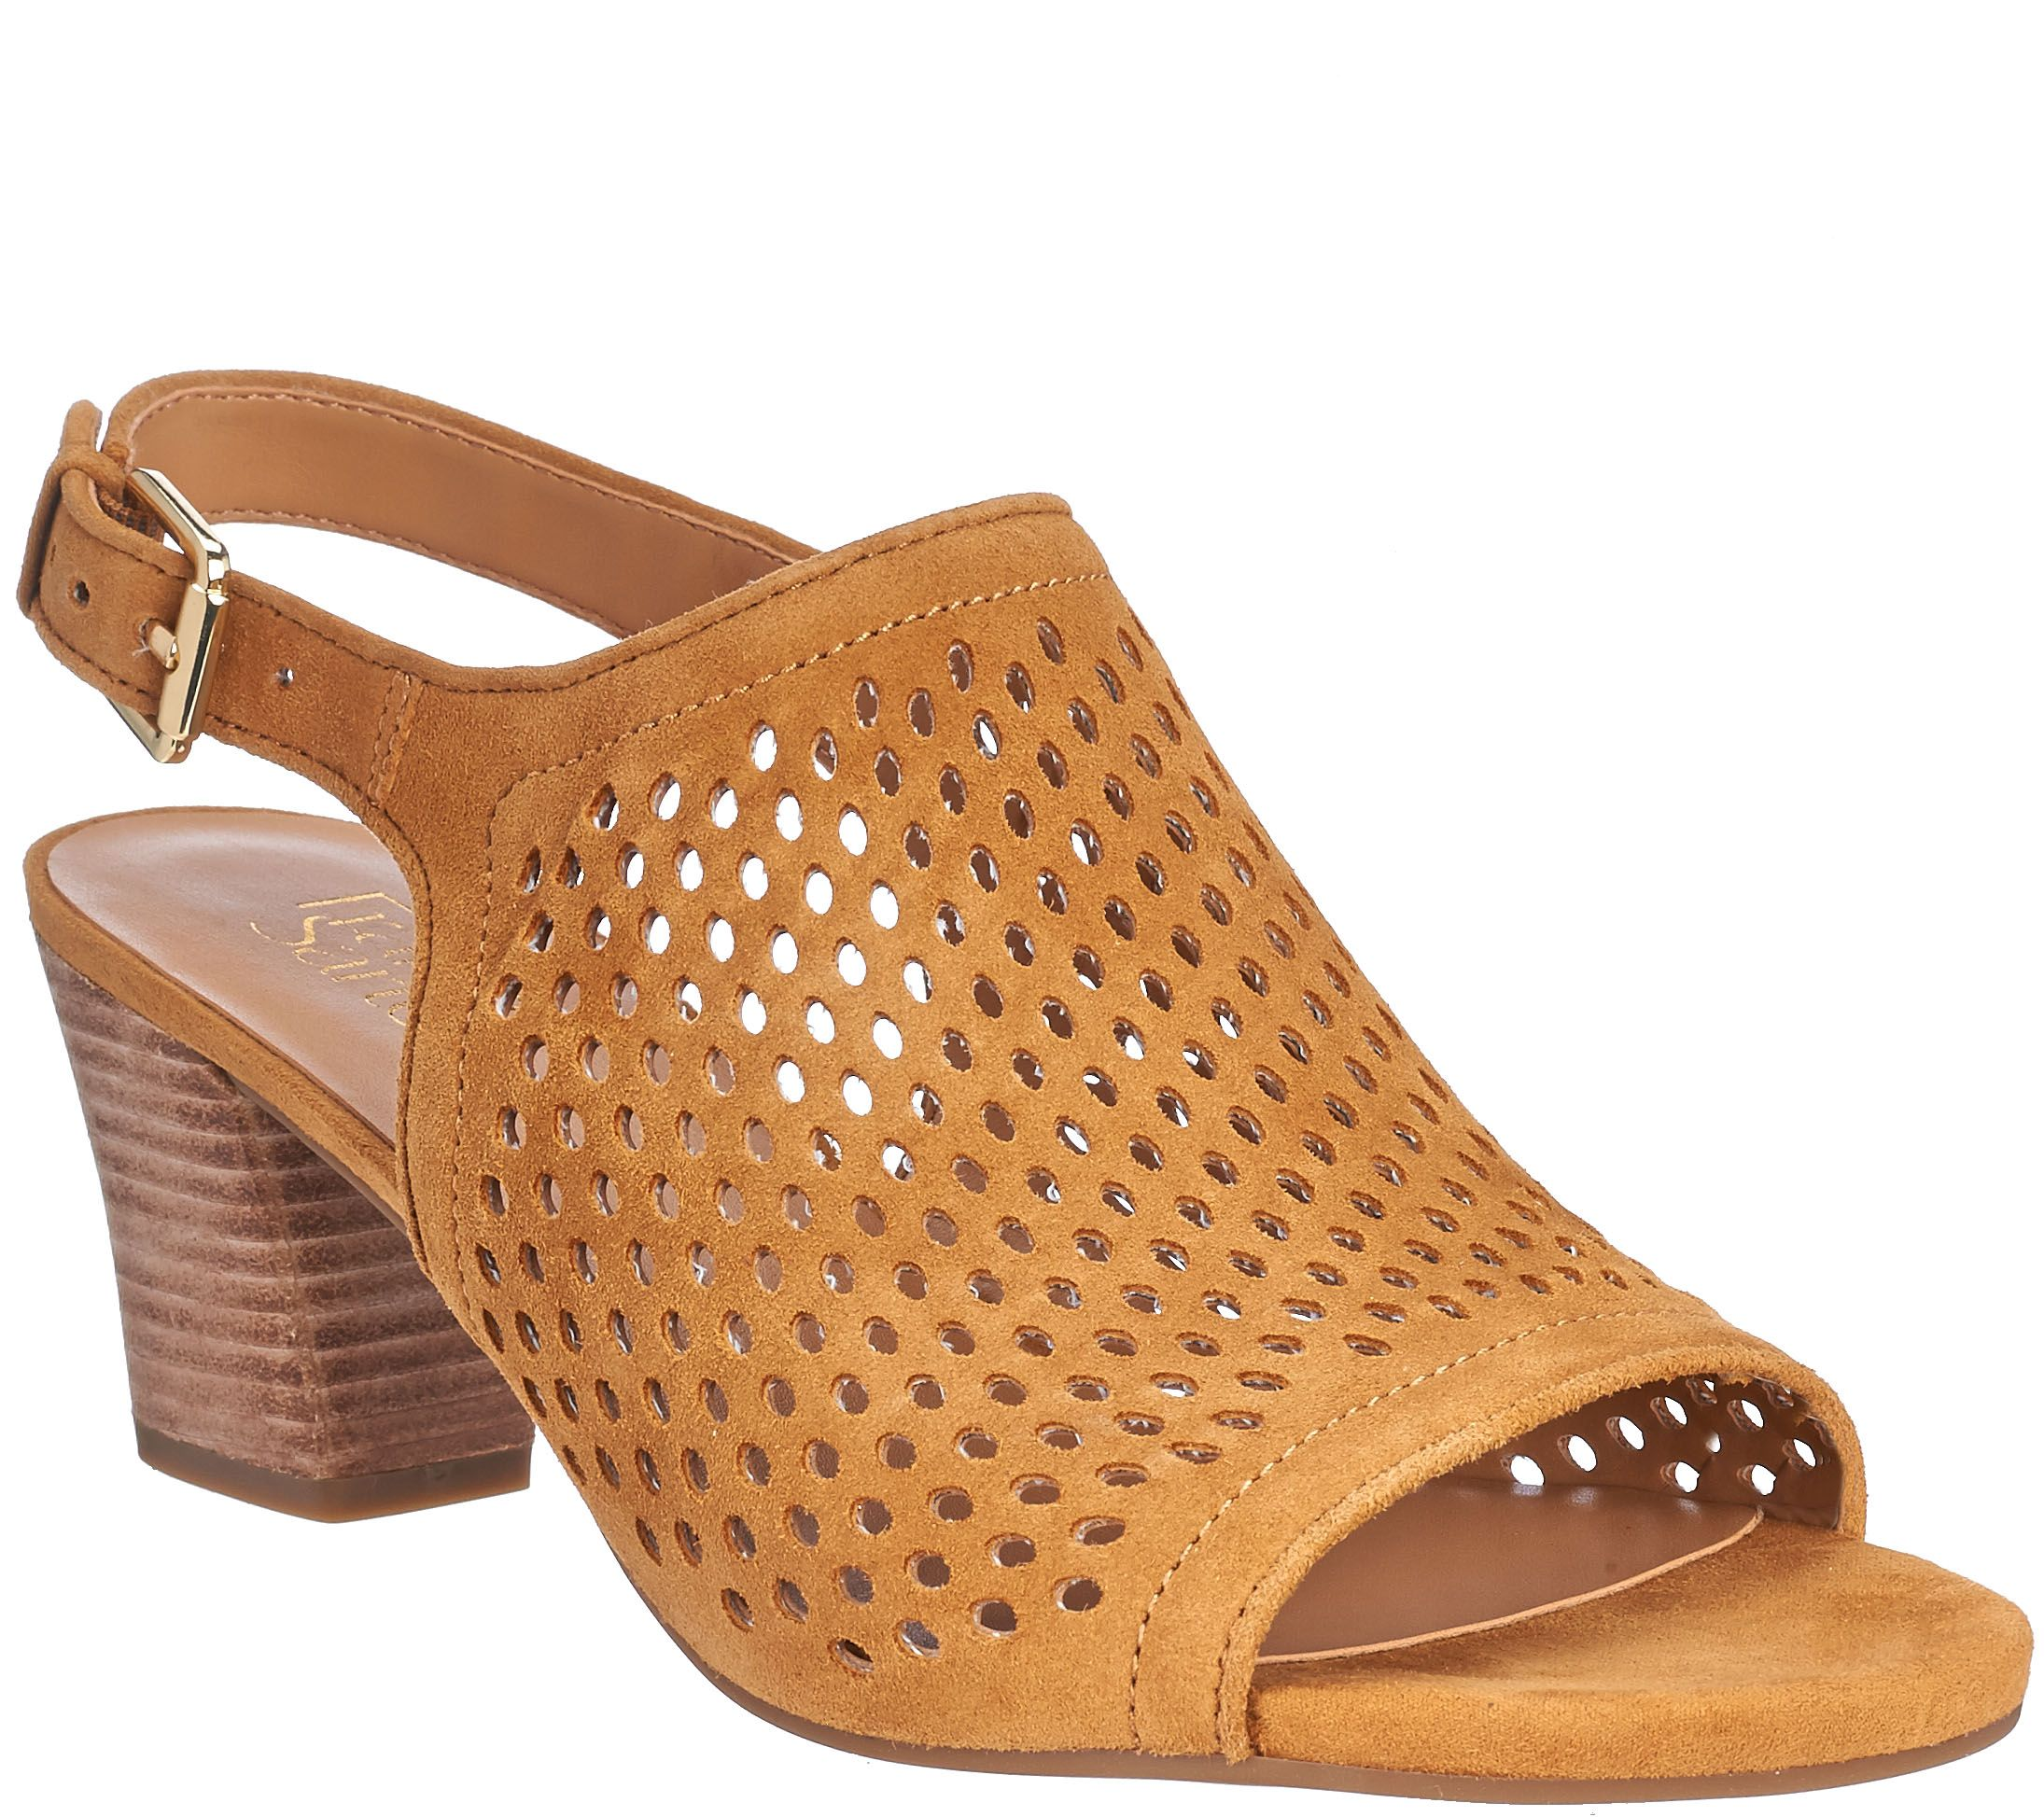 Franco Sarto Monaco2 Sandal (Women's) SsQ2DLY